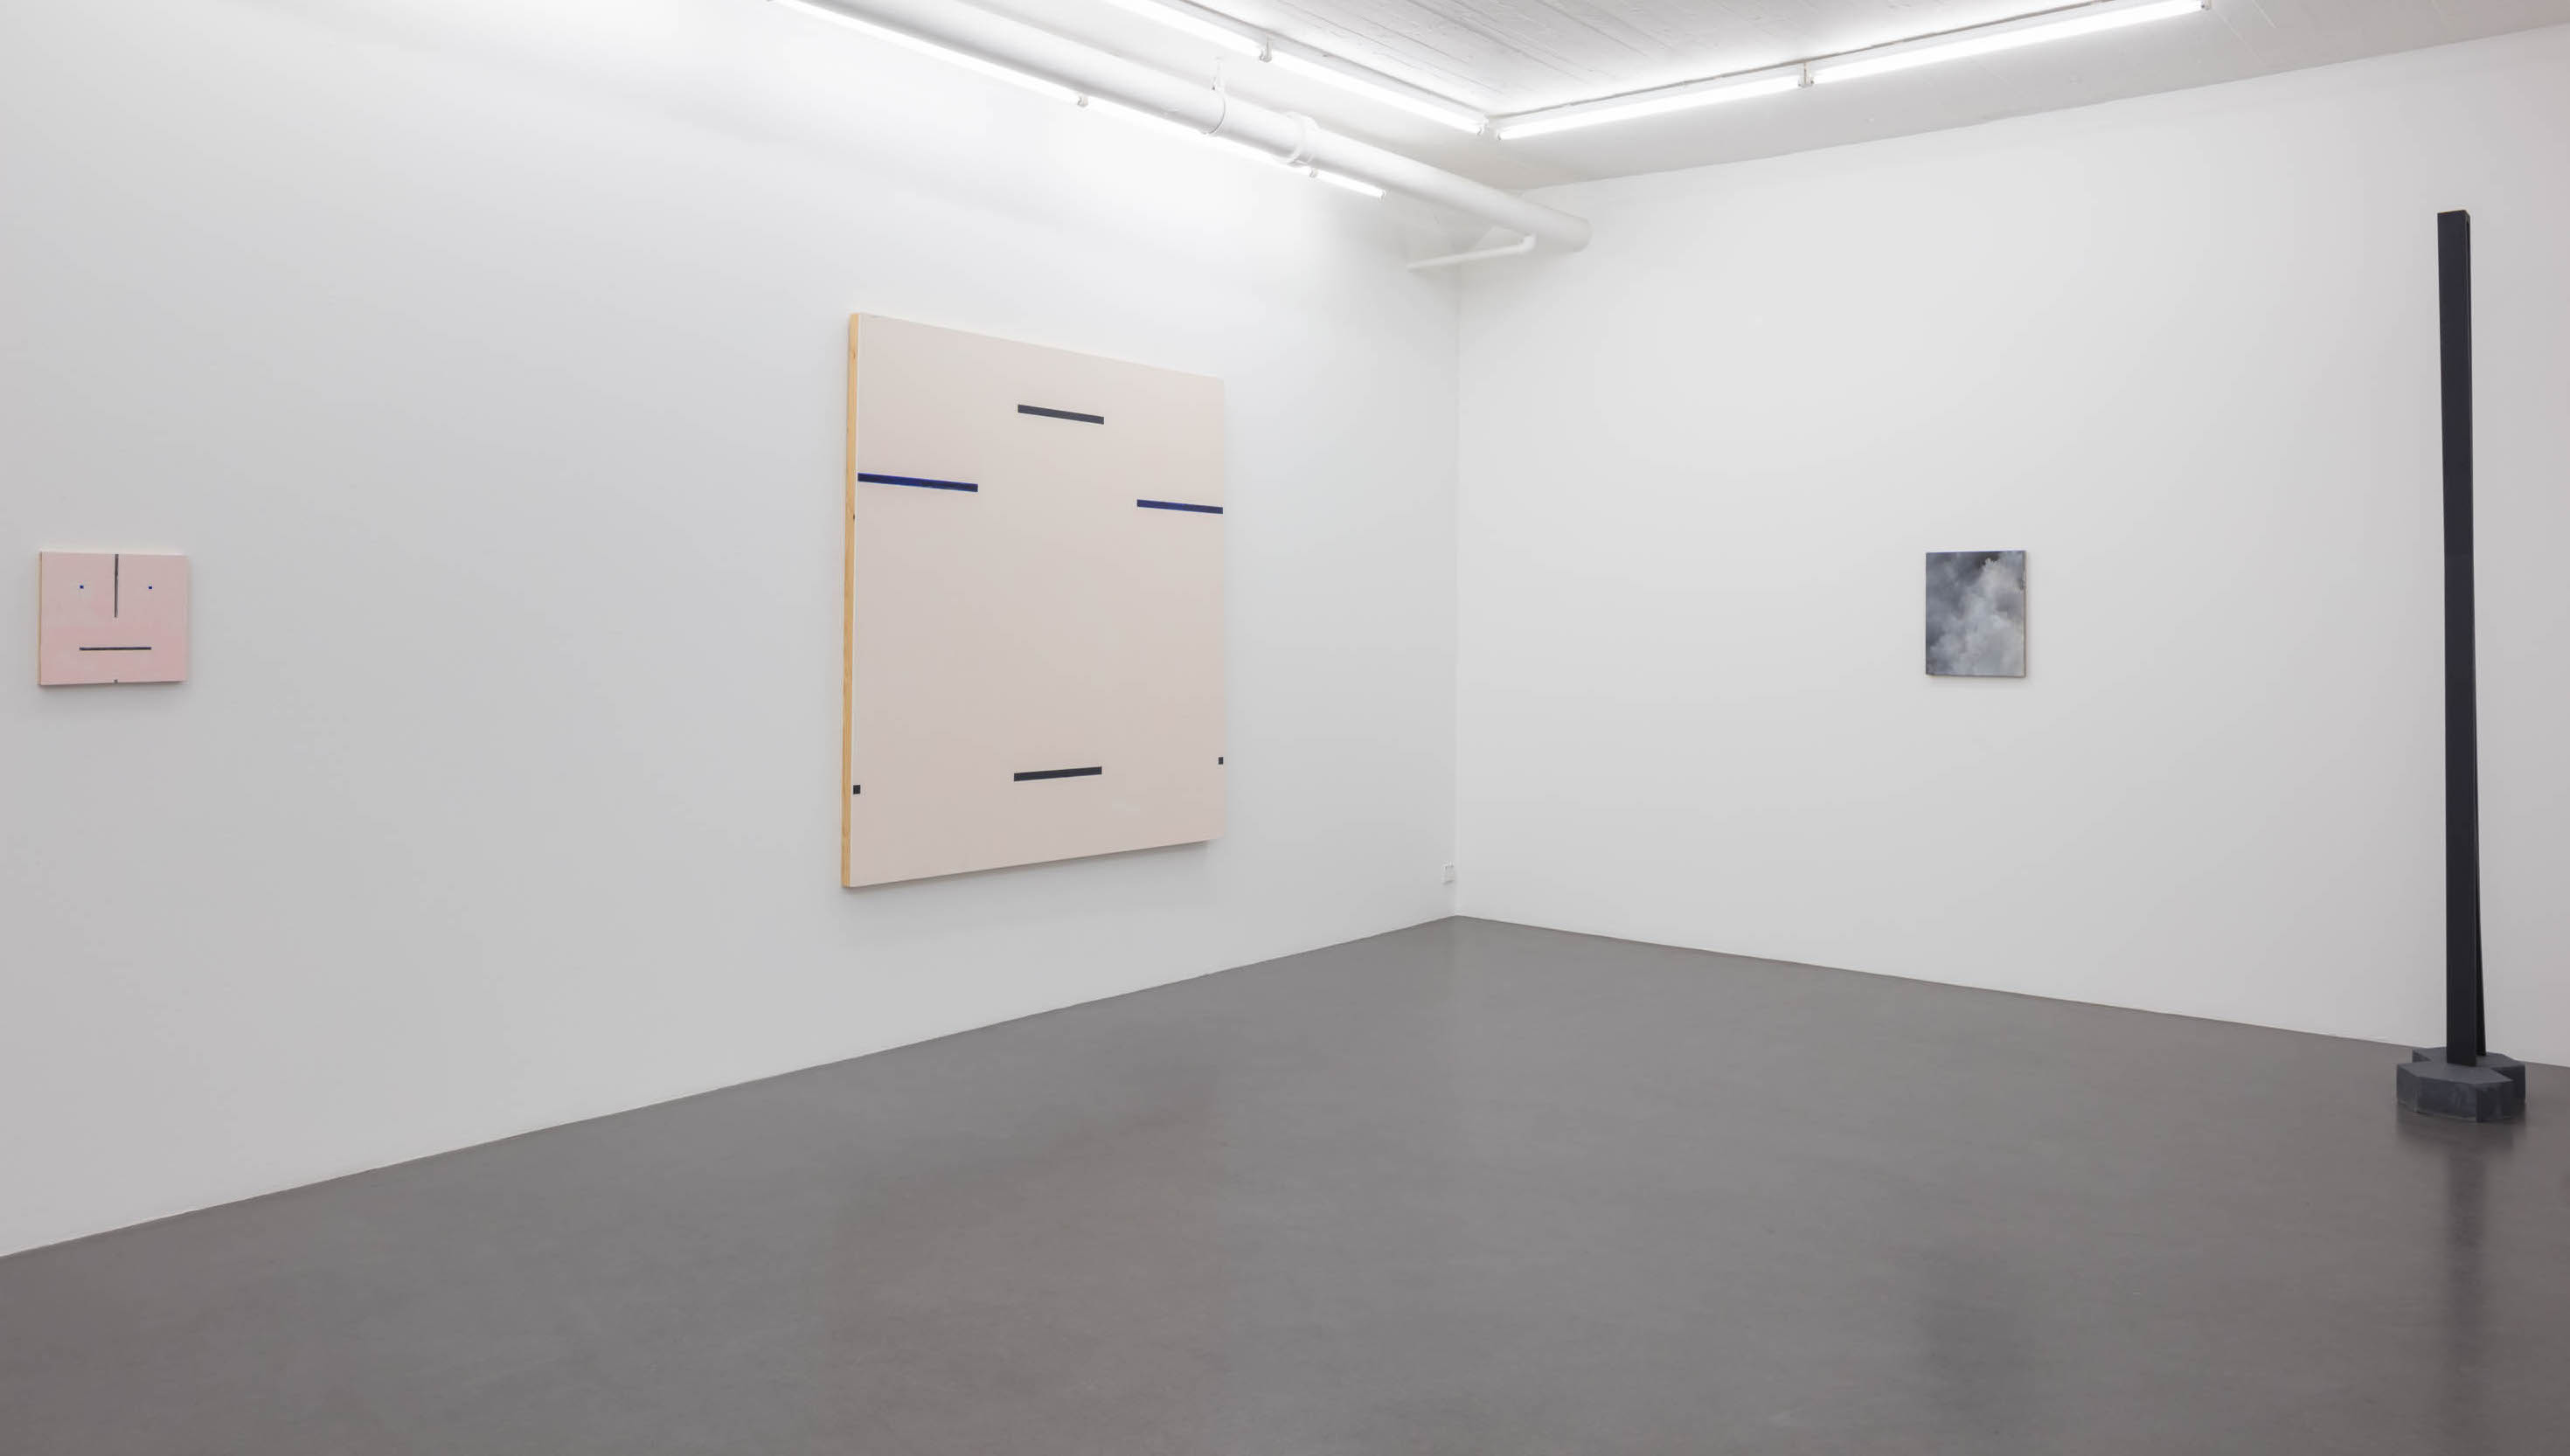 Installationview: Lars Olof Loeld/Jakob Solgren 2017 at Galleri Flach